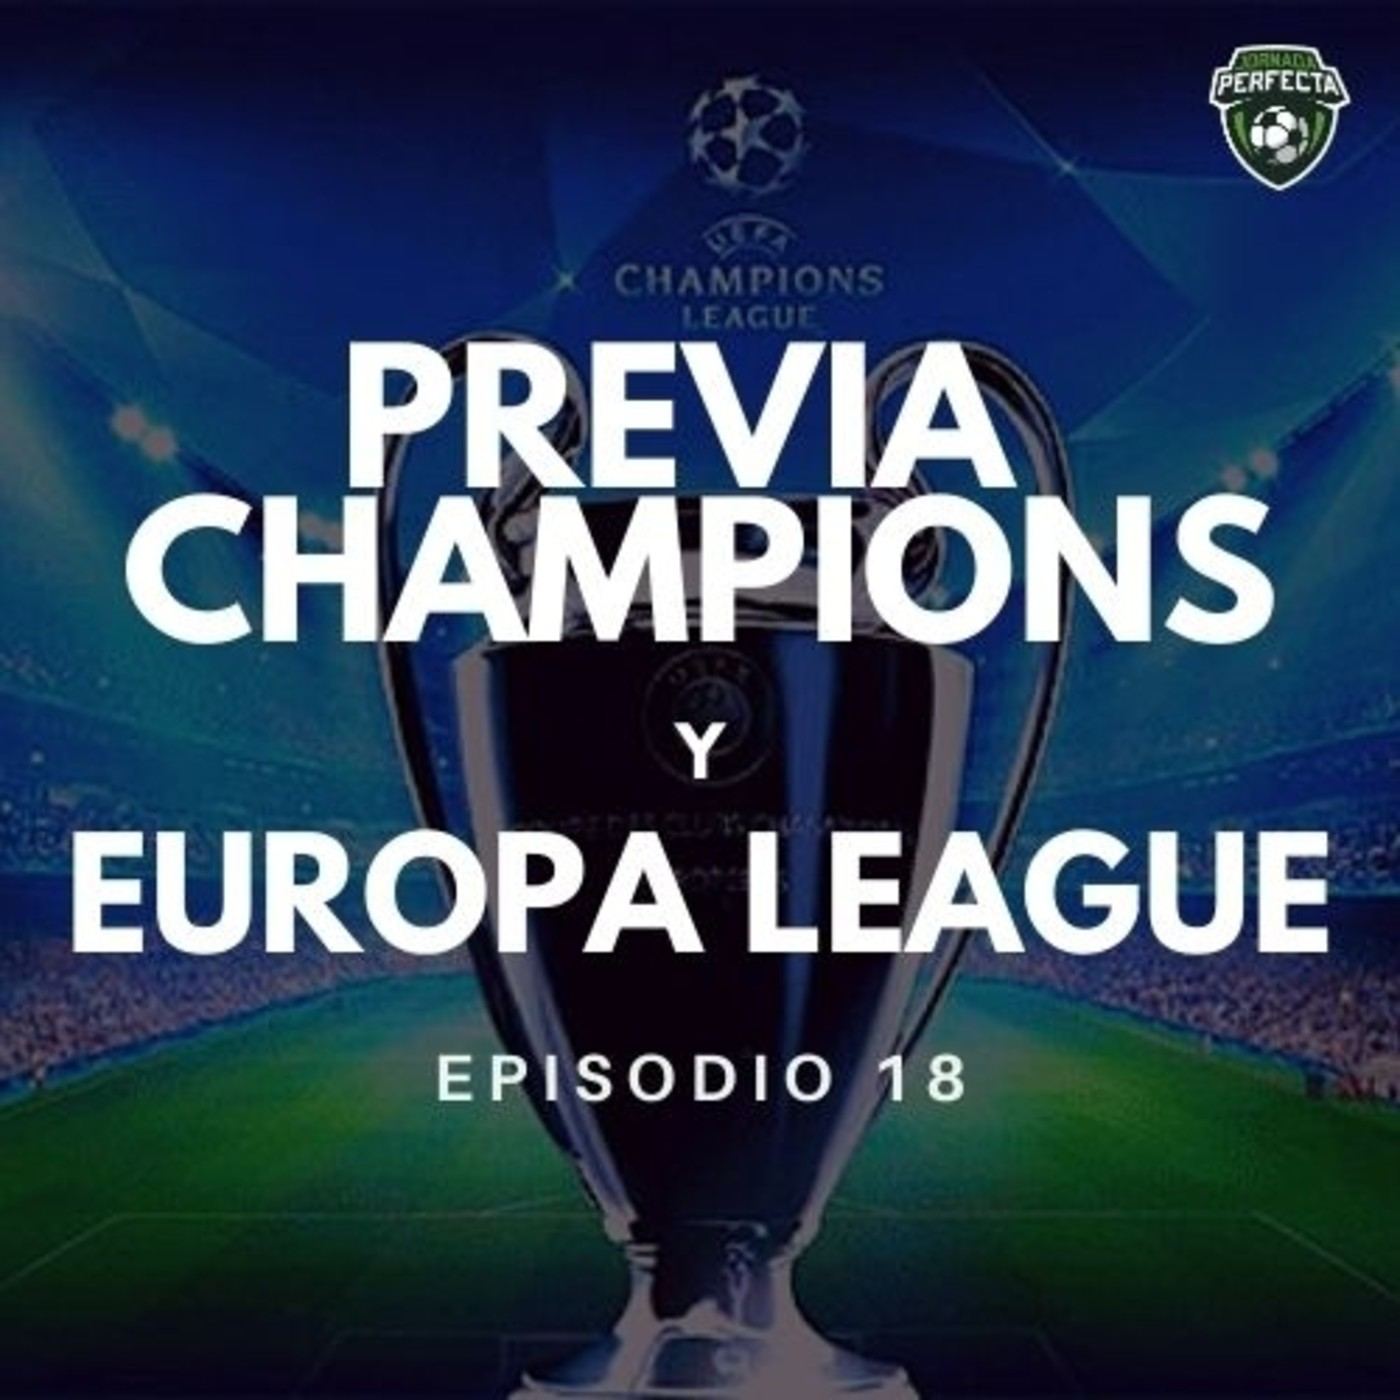 3x18 - PREVIA CHAMPIONS Y EUROPA LEAGUE